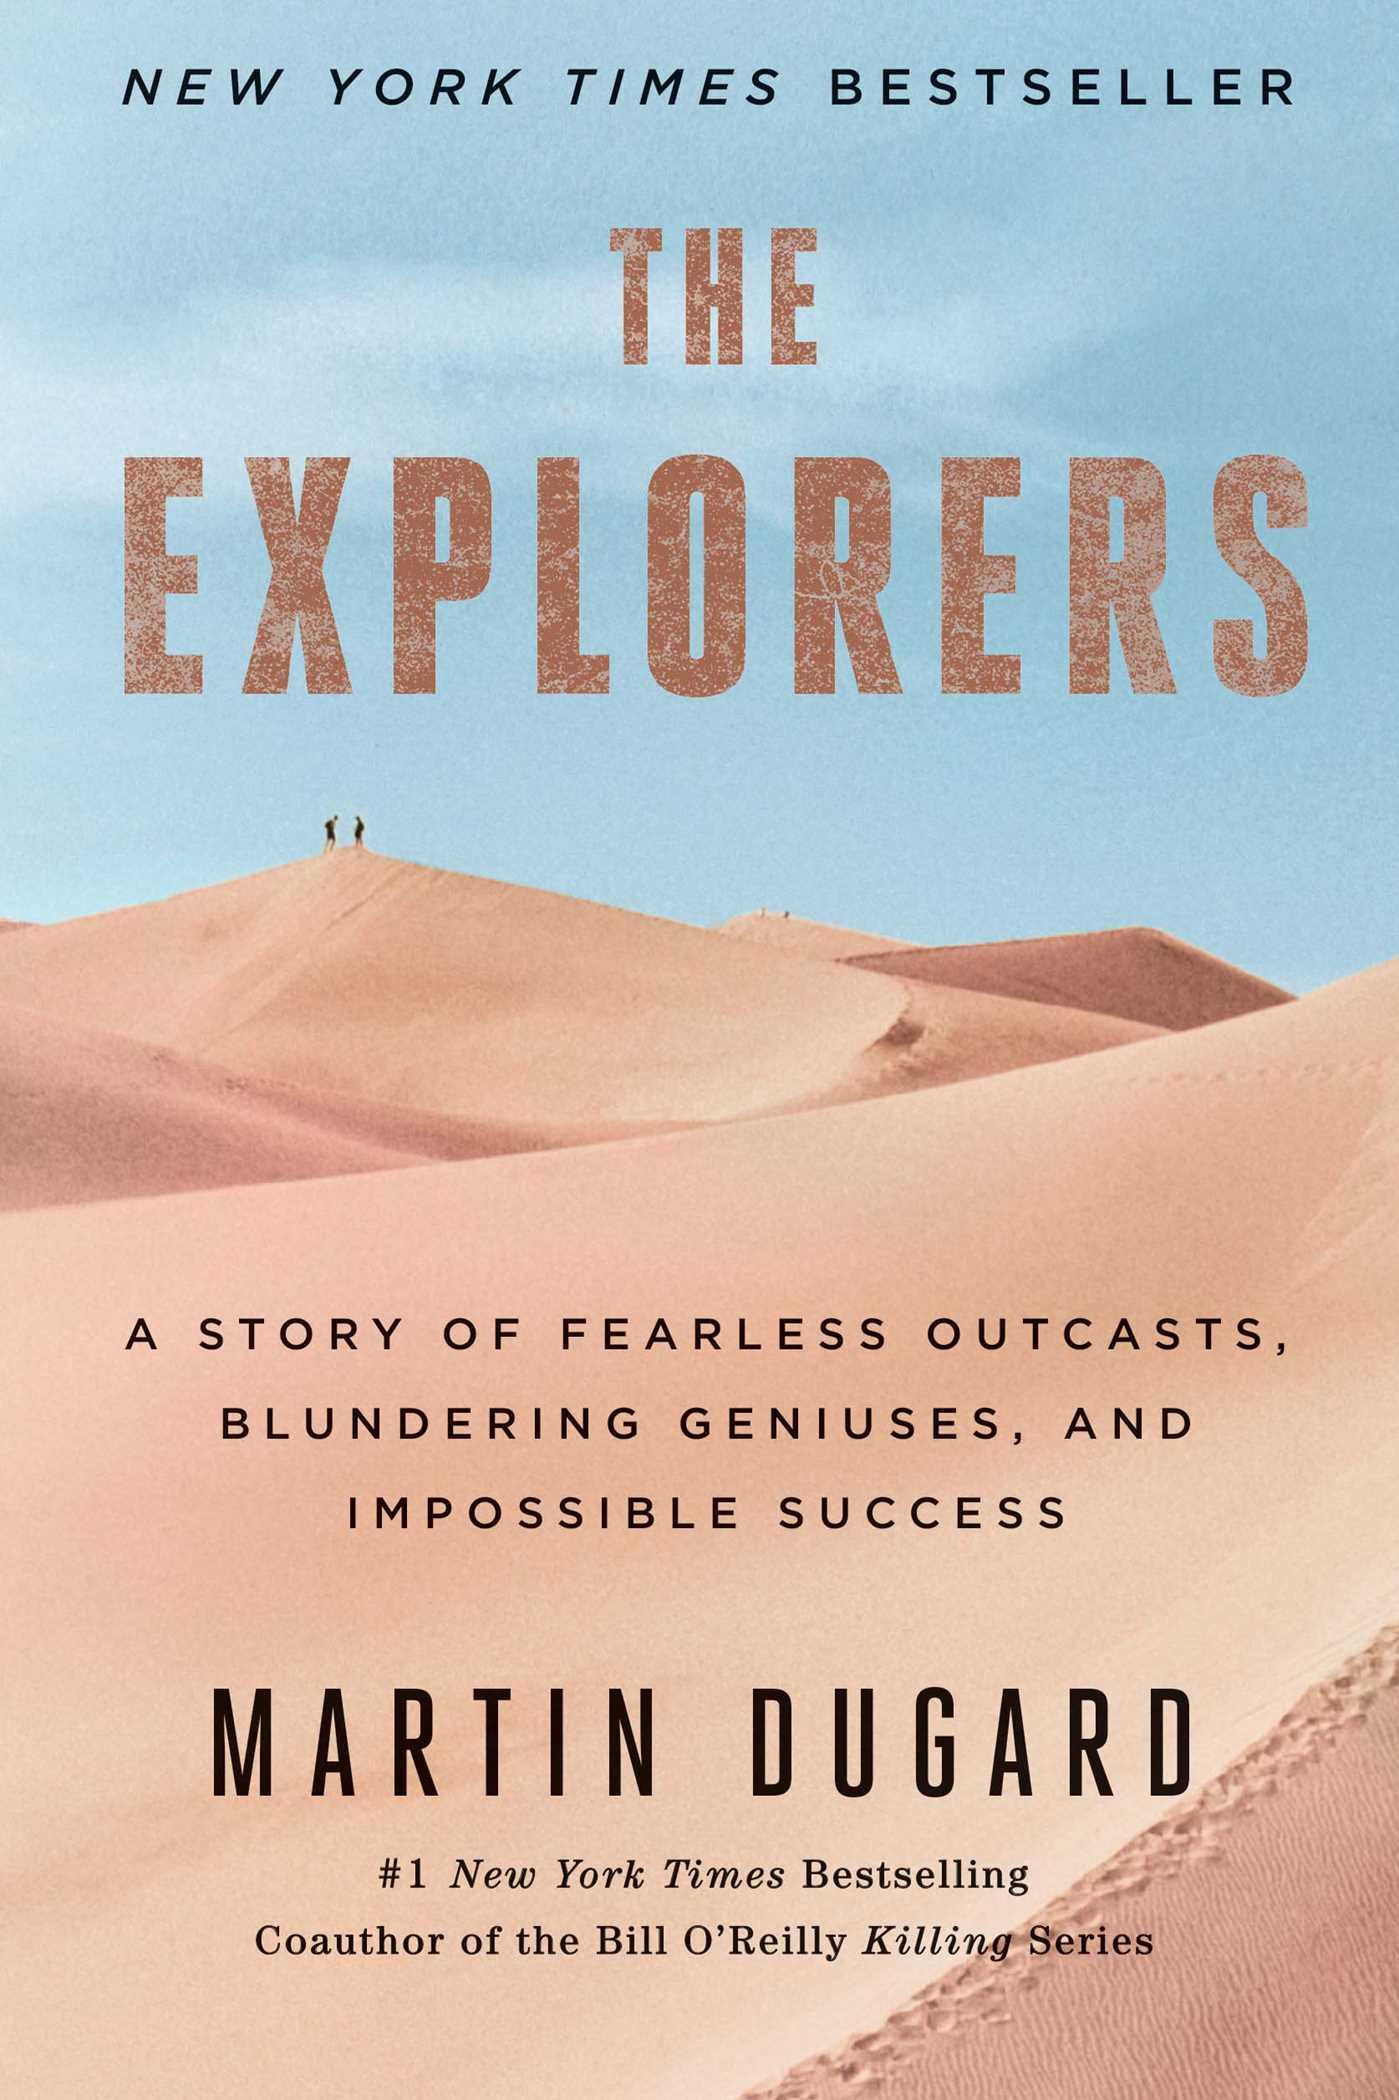 The explorers 9781451677591 hr